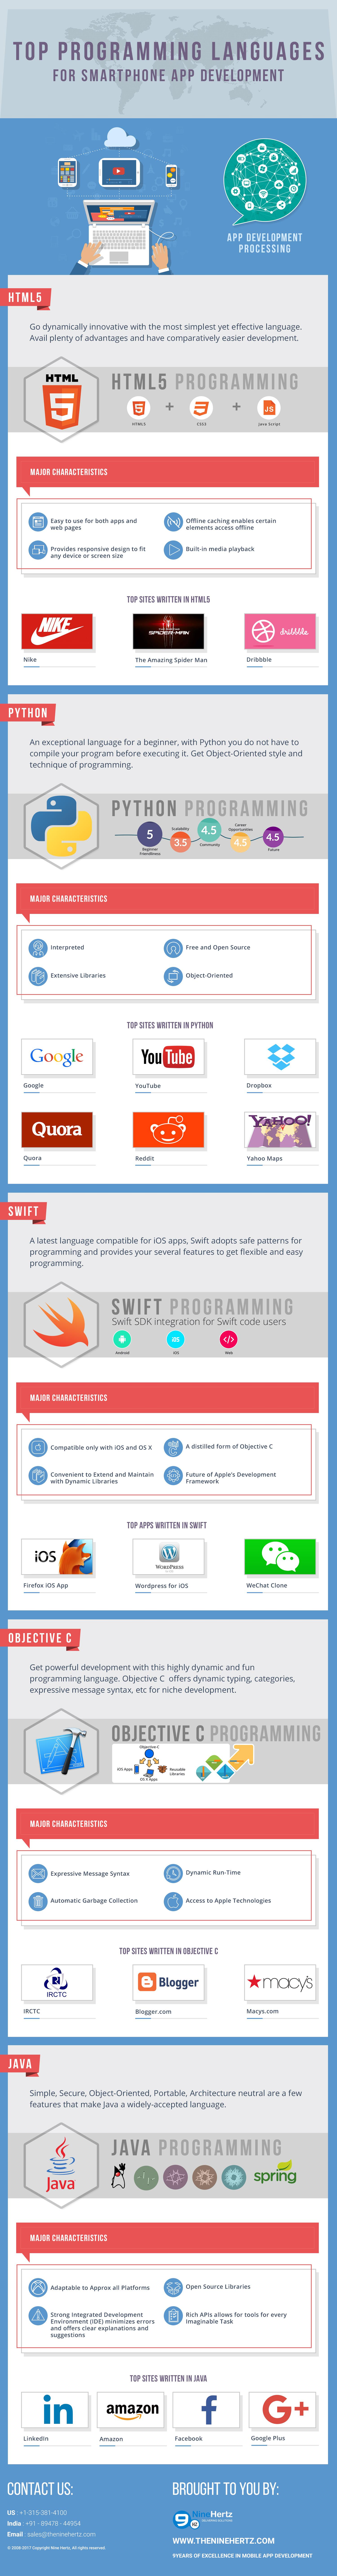 Best Programming Languages for App Development